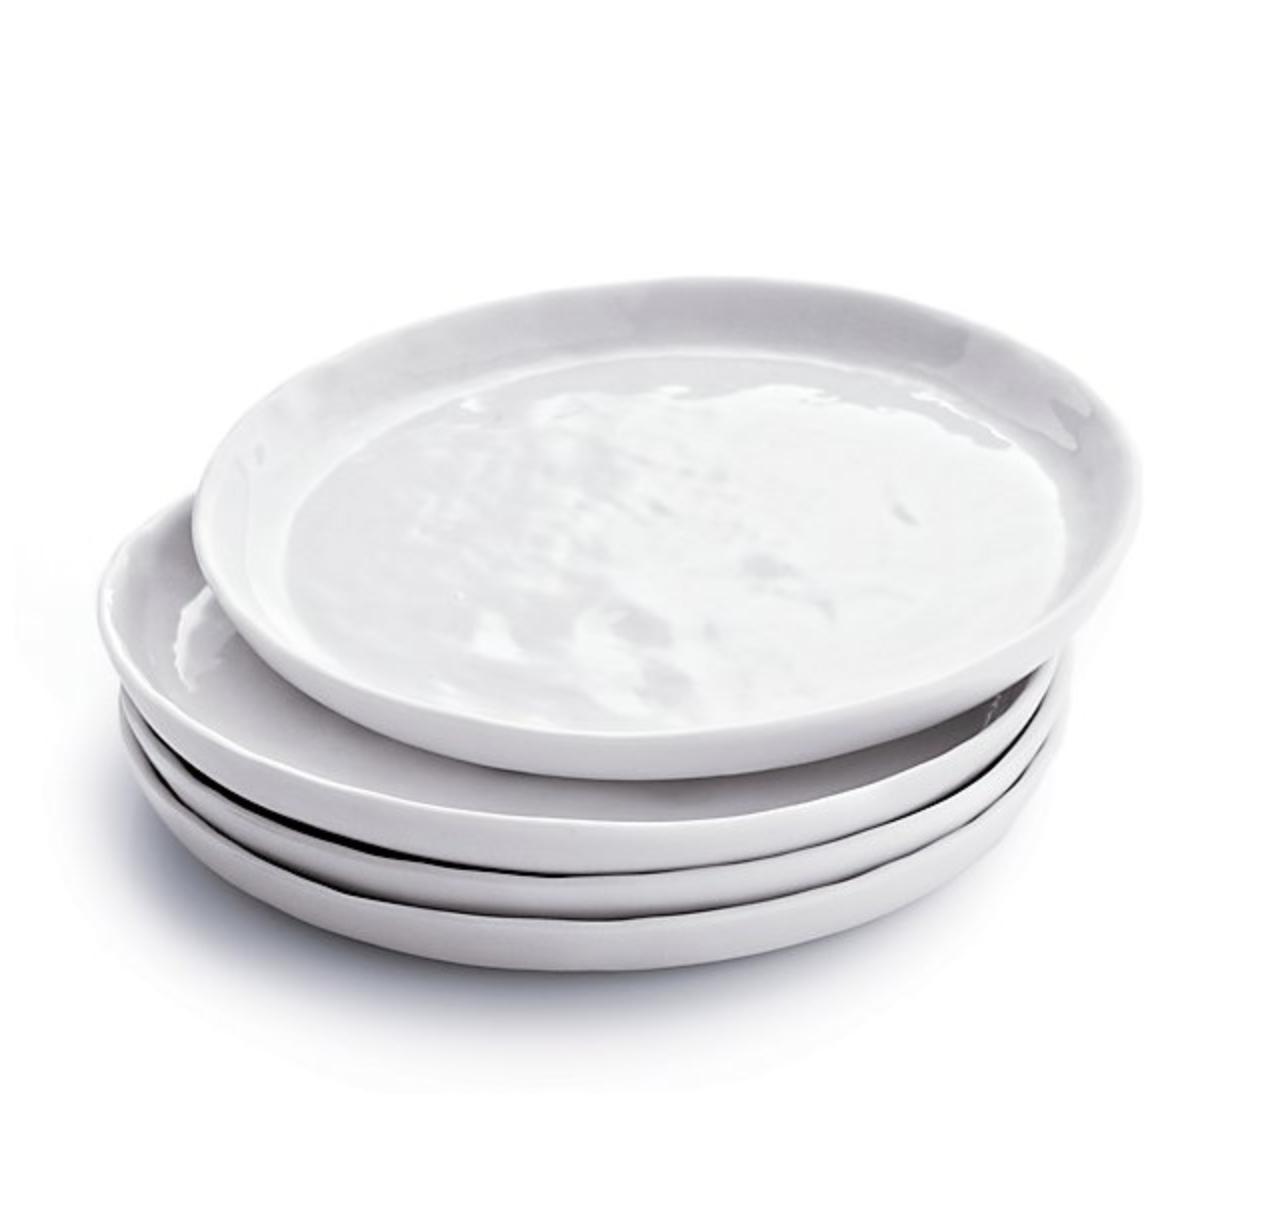 Crate & Barrel appetizer plates